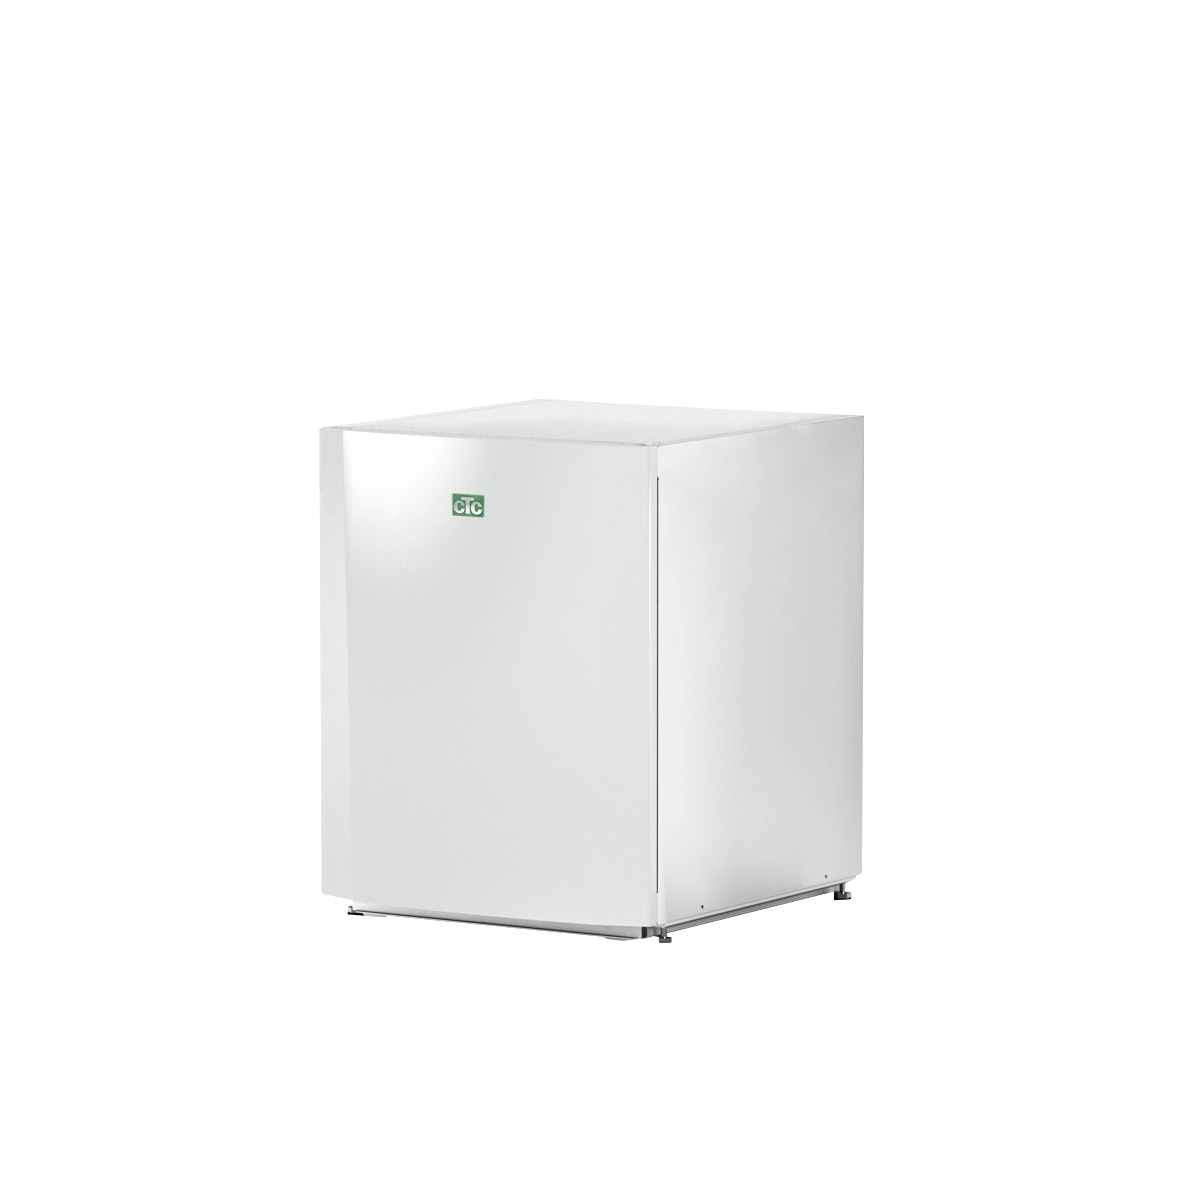 Värmepump CTC Ecopart Modell 417LEP A++